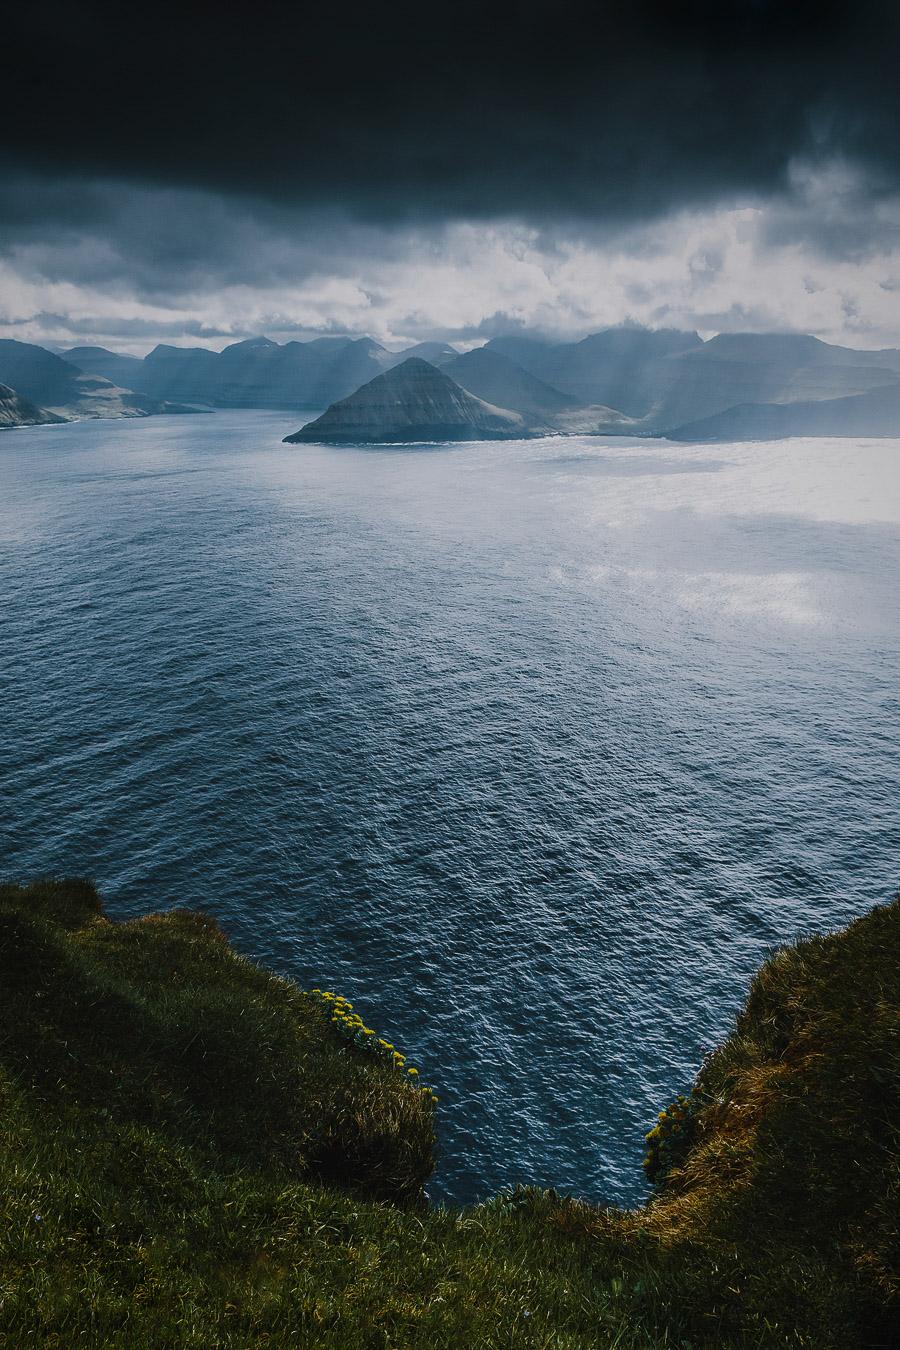 Blue ocean, tall mountains and sunlight in Faroe Islands